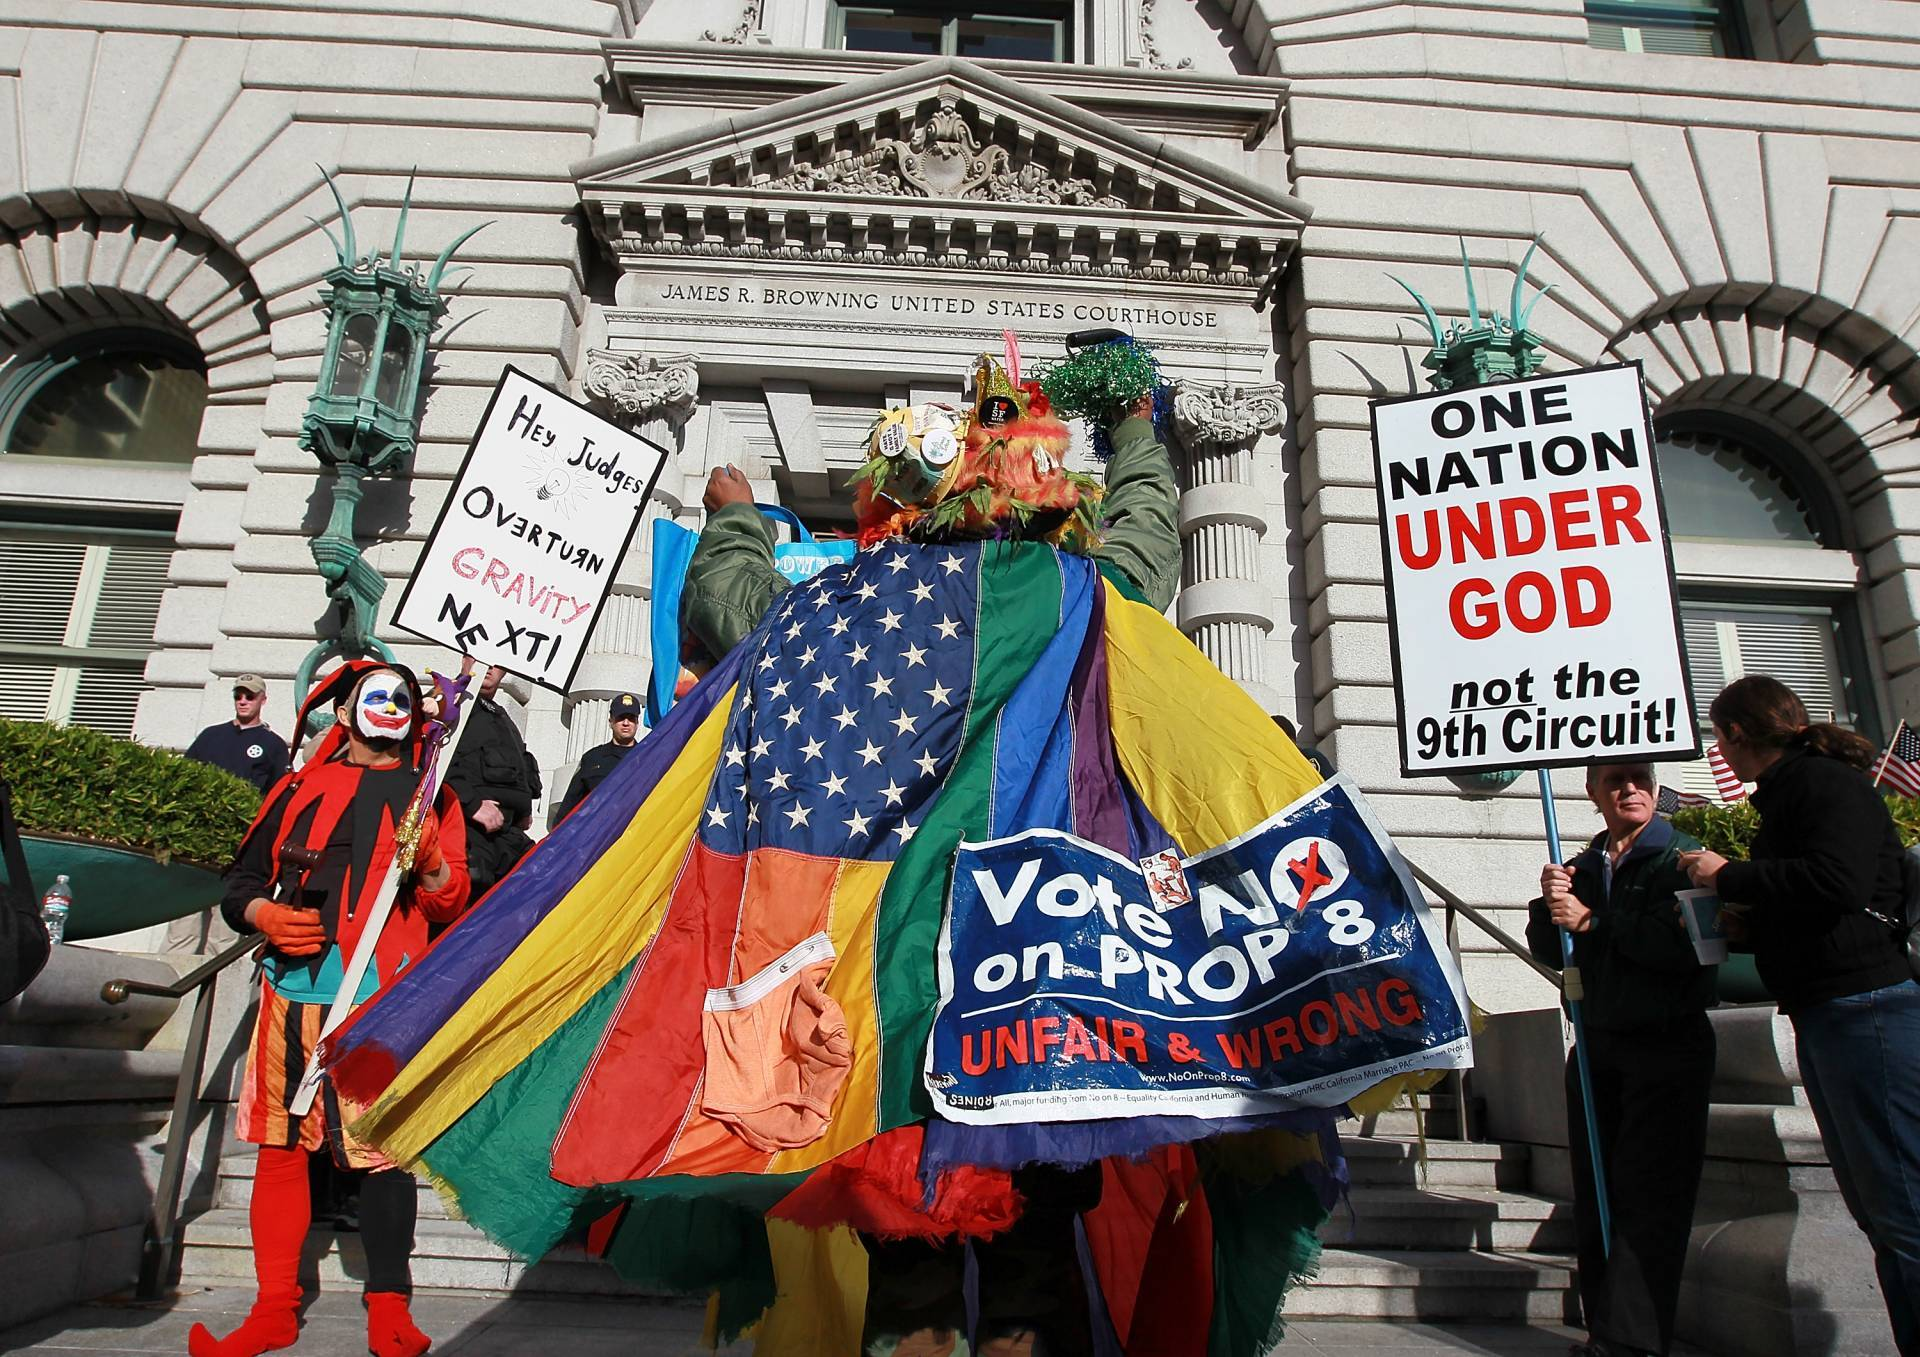 Federal Appeals Court Strikes Down Utah Ban On Same